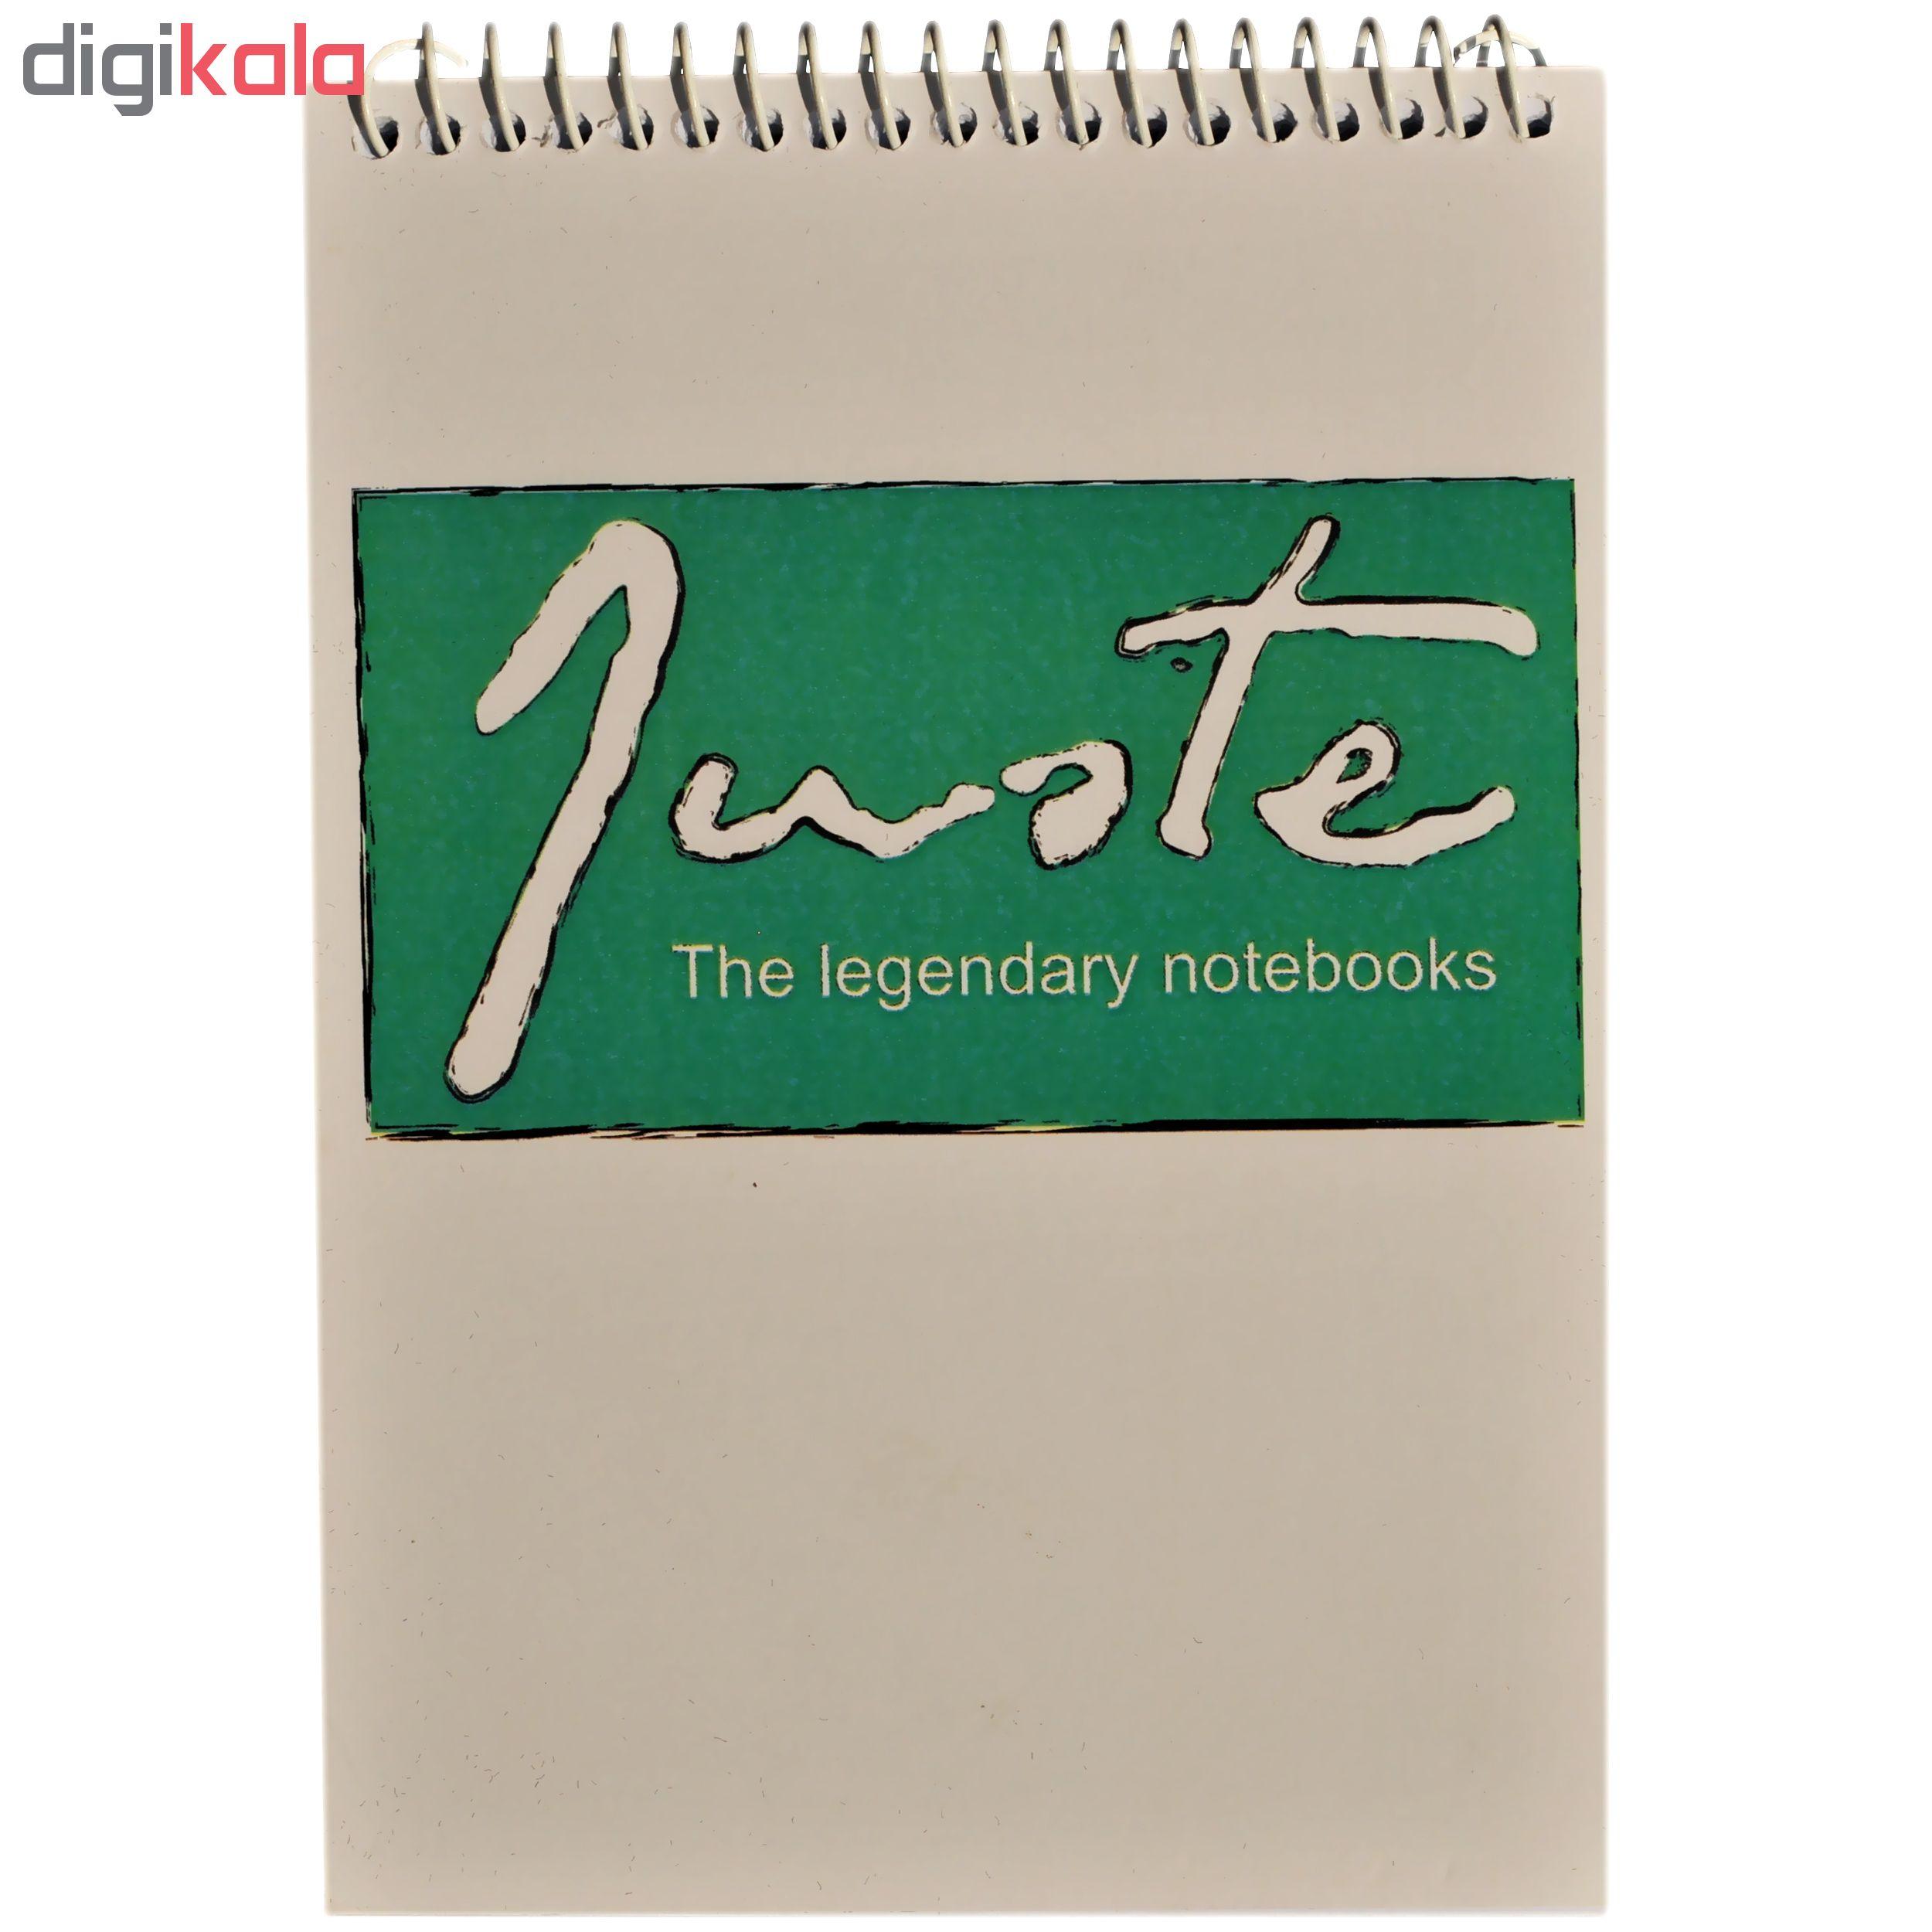 دفتر یادداشت ژوست طرح فولکس واگن مدل کژوال خبرنگاری